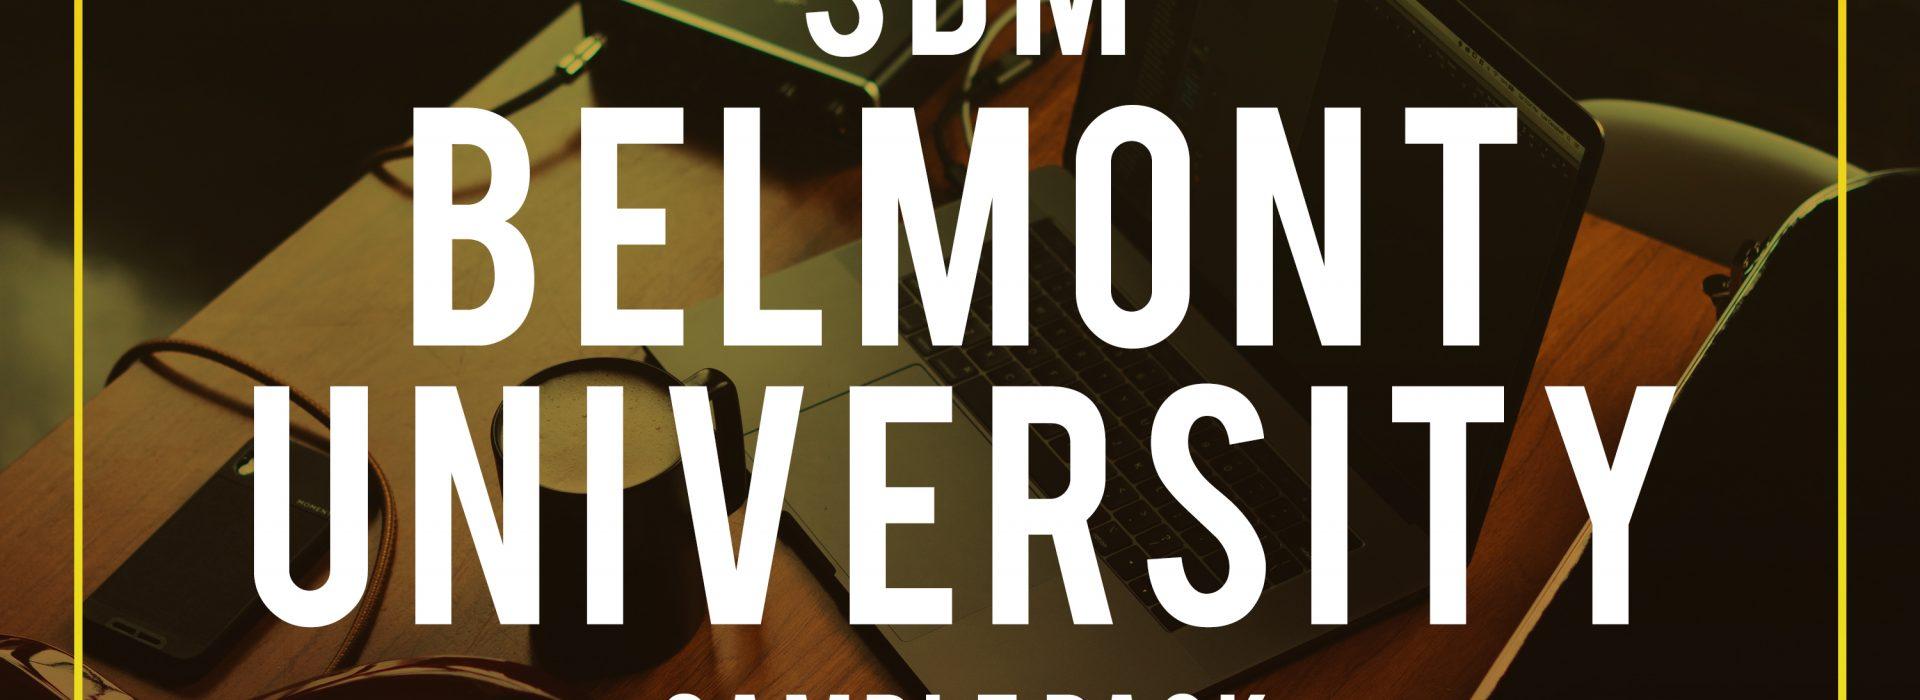 Sample Tools by Cr2 – SDM Belmont University Sample Pack